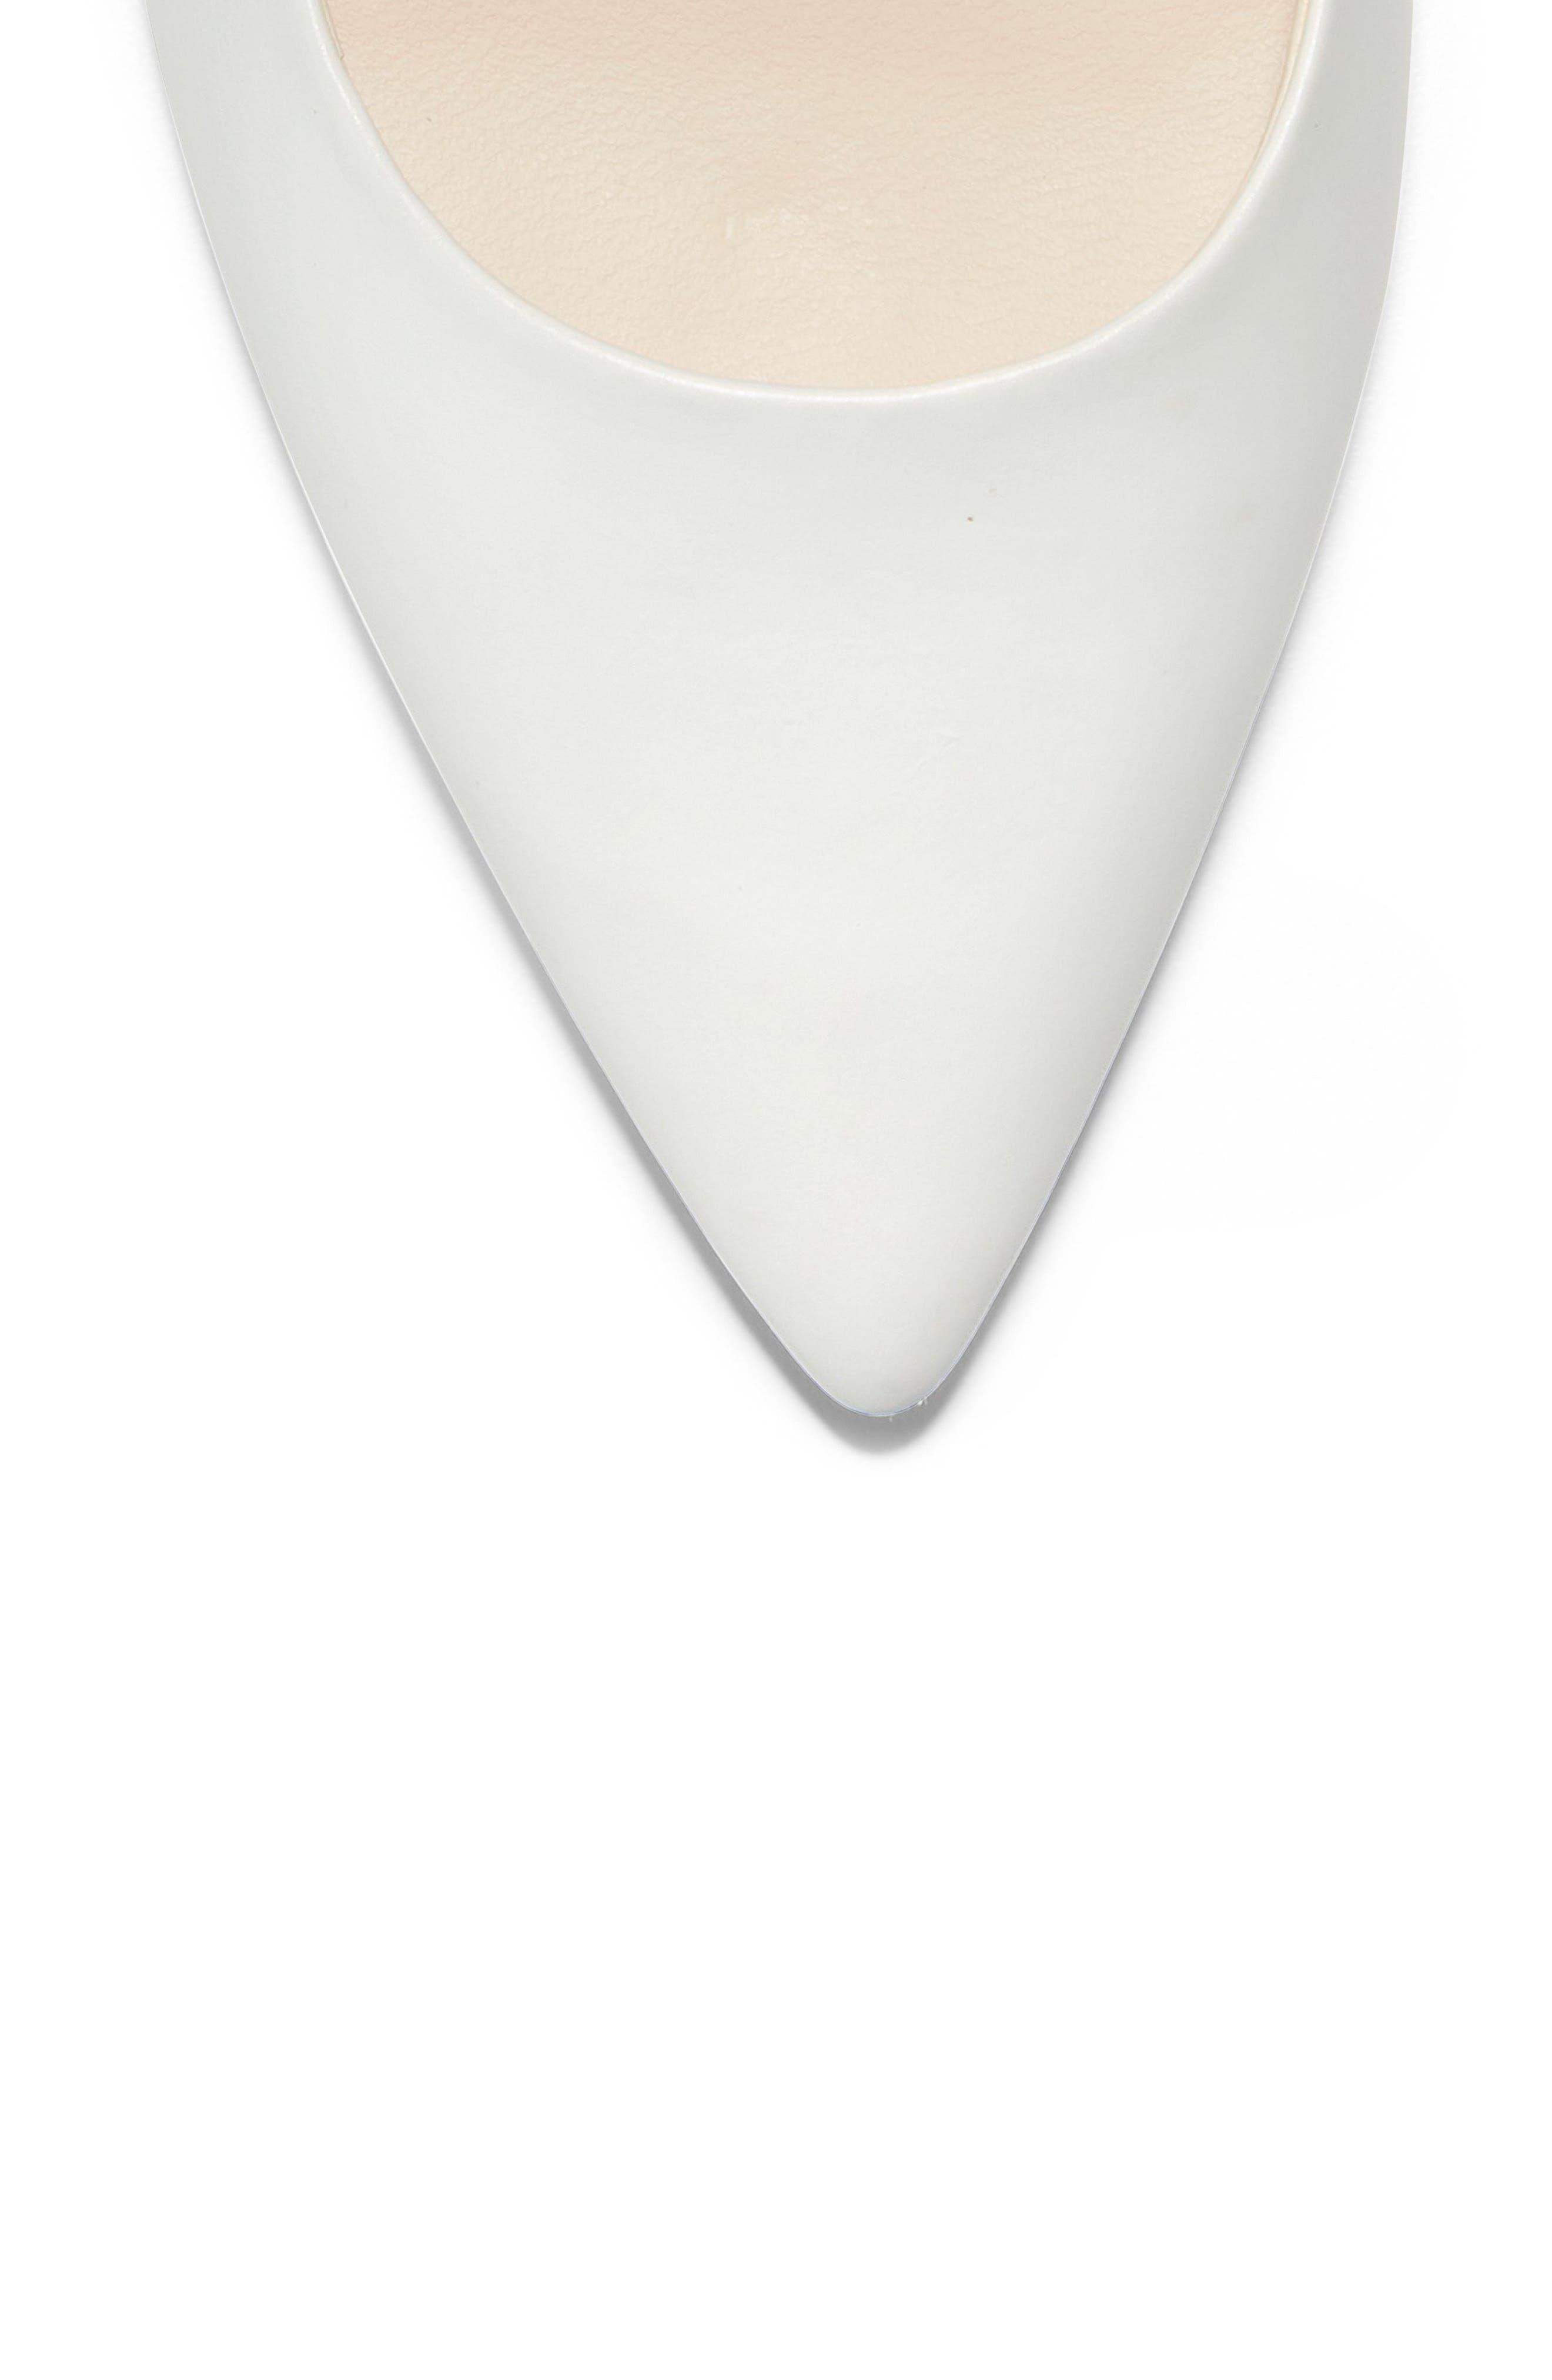 Vesta Pointy Toe Pump,                             Alternate thumbnail 7, color,                             WHITE LEATHER